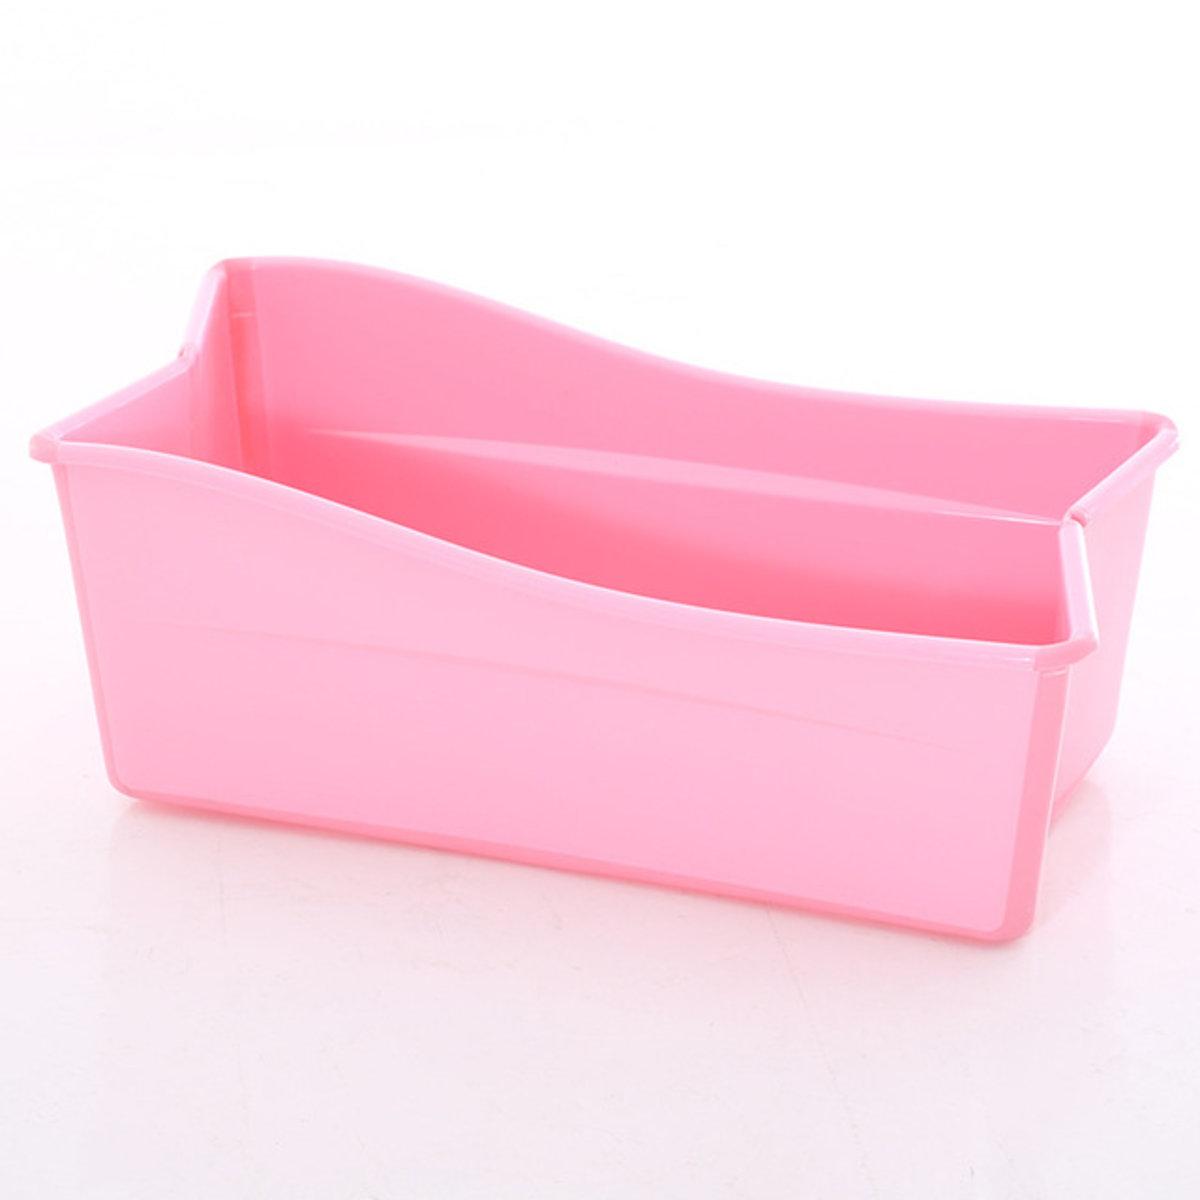 Smart Baby | Portable/Foldable Bath Tube-Pink | HKTVmall Online Shopping